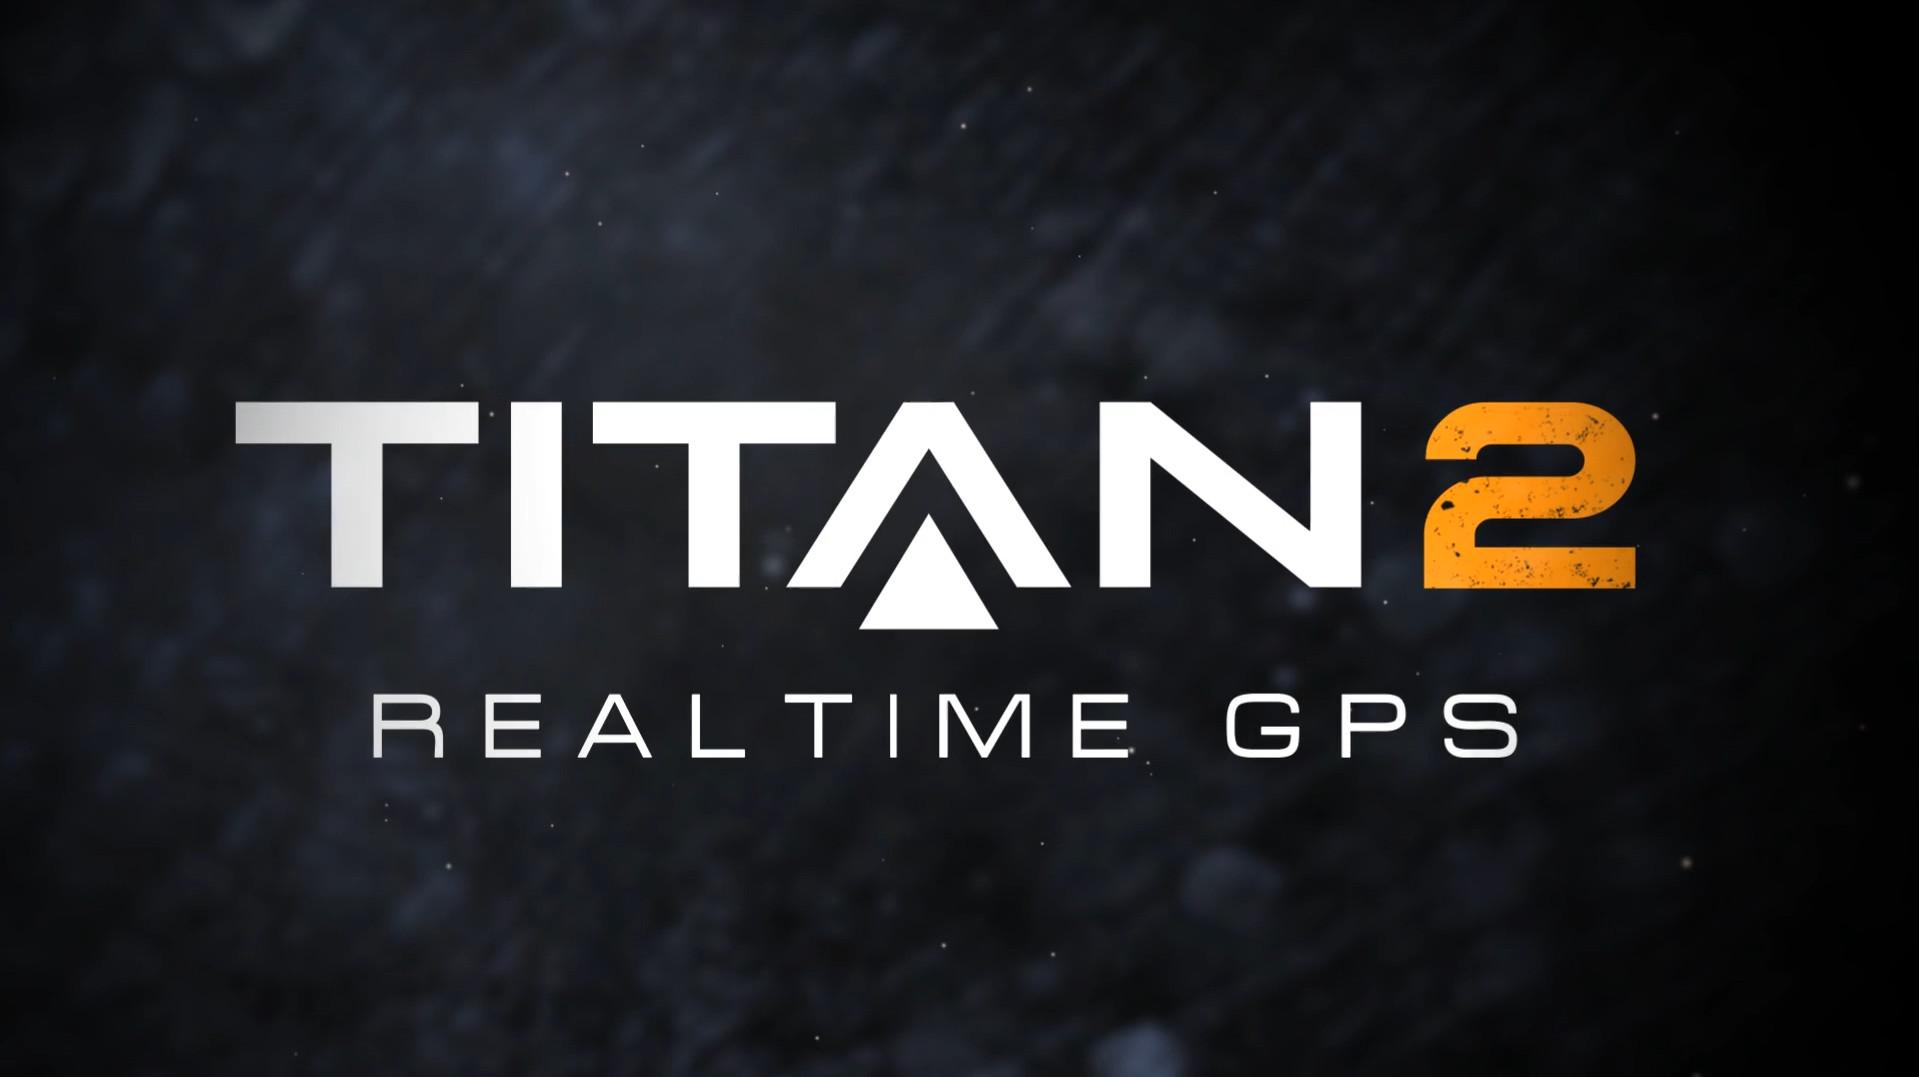 titan2teaser